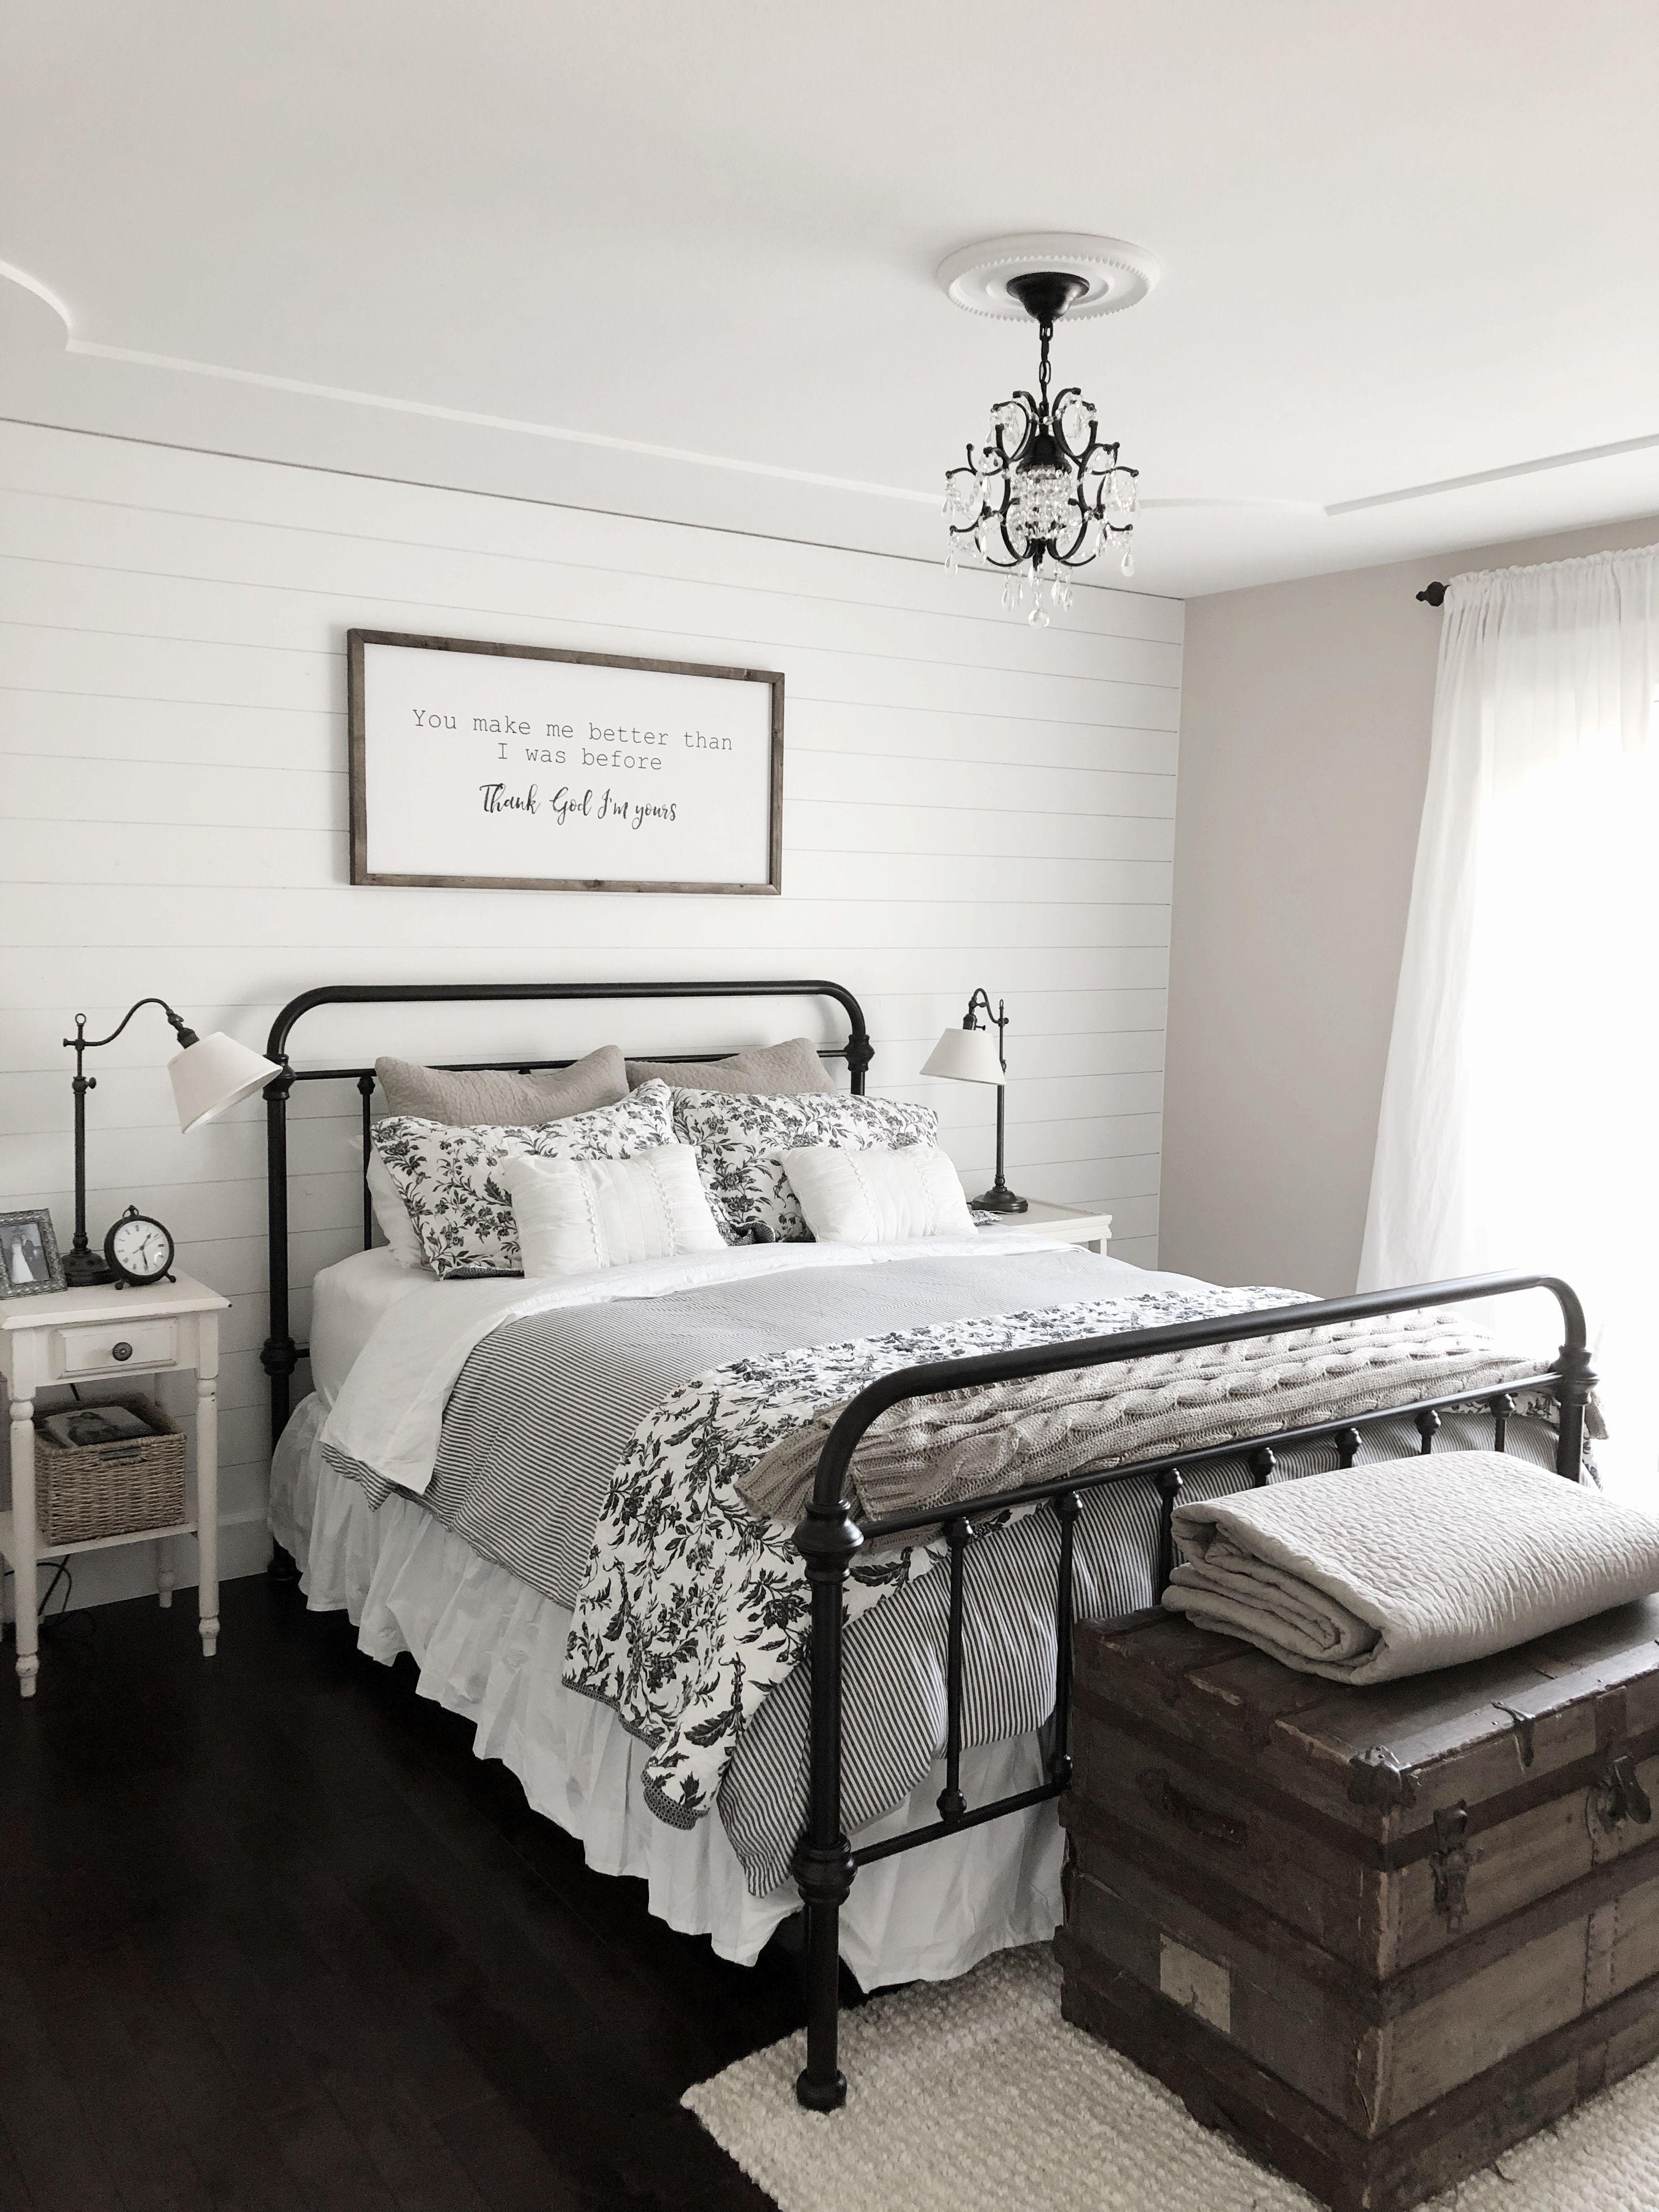 simplelifefarmhousecom  Home Decor in 2019  Modern